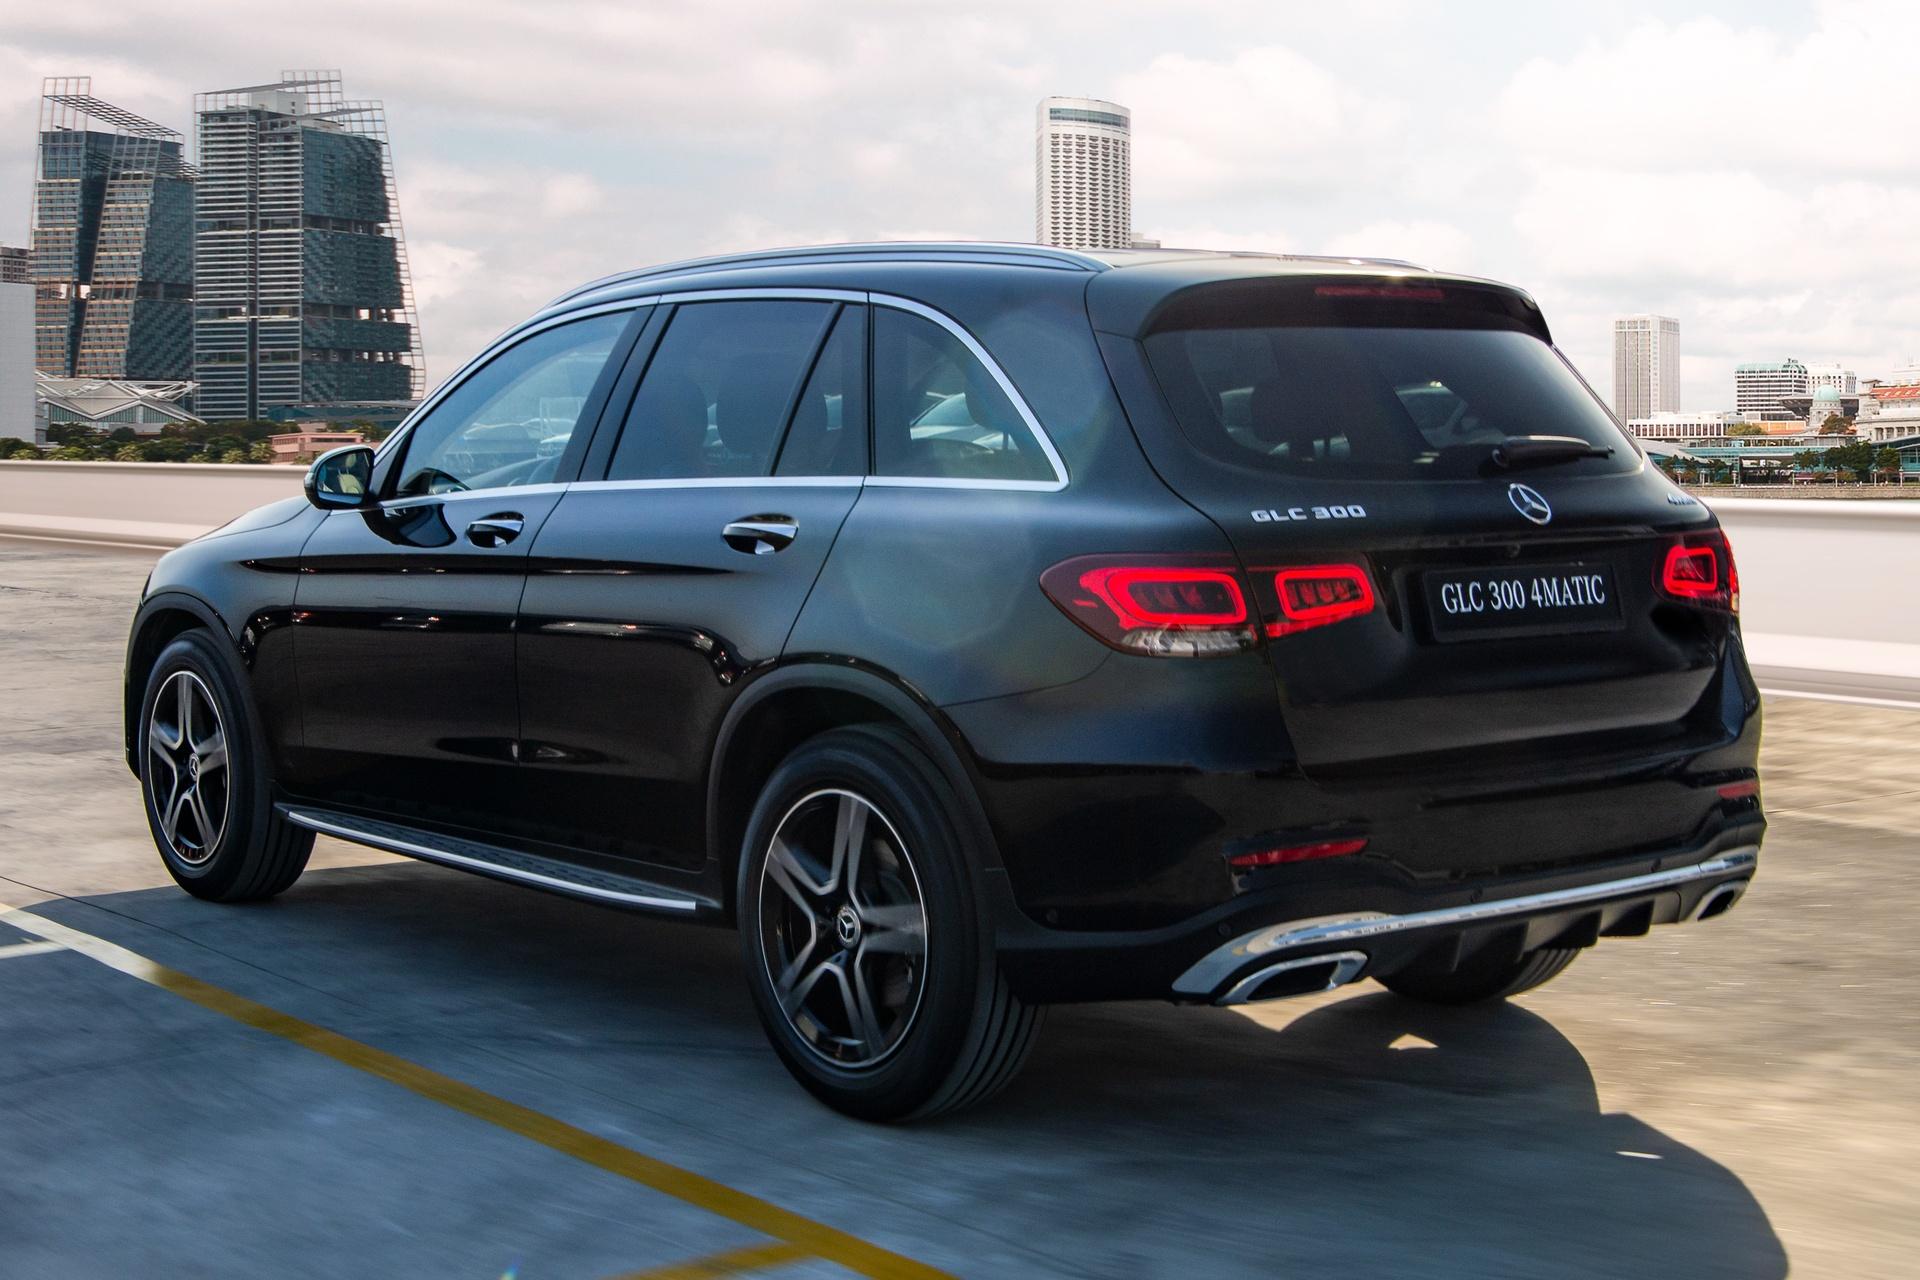 Audi Q5 2021 canh tranh Mercedes GLC anh 5